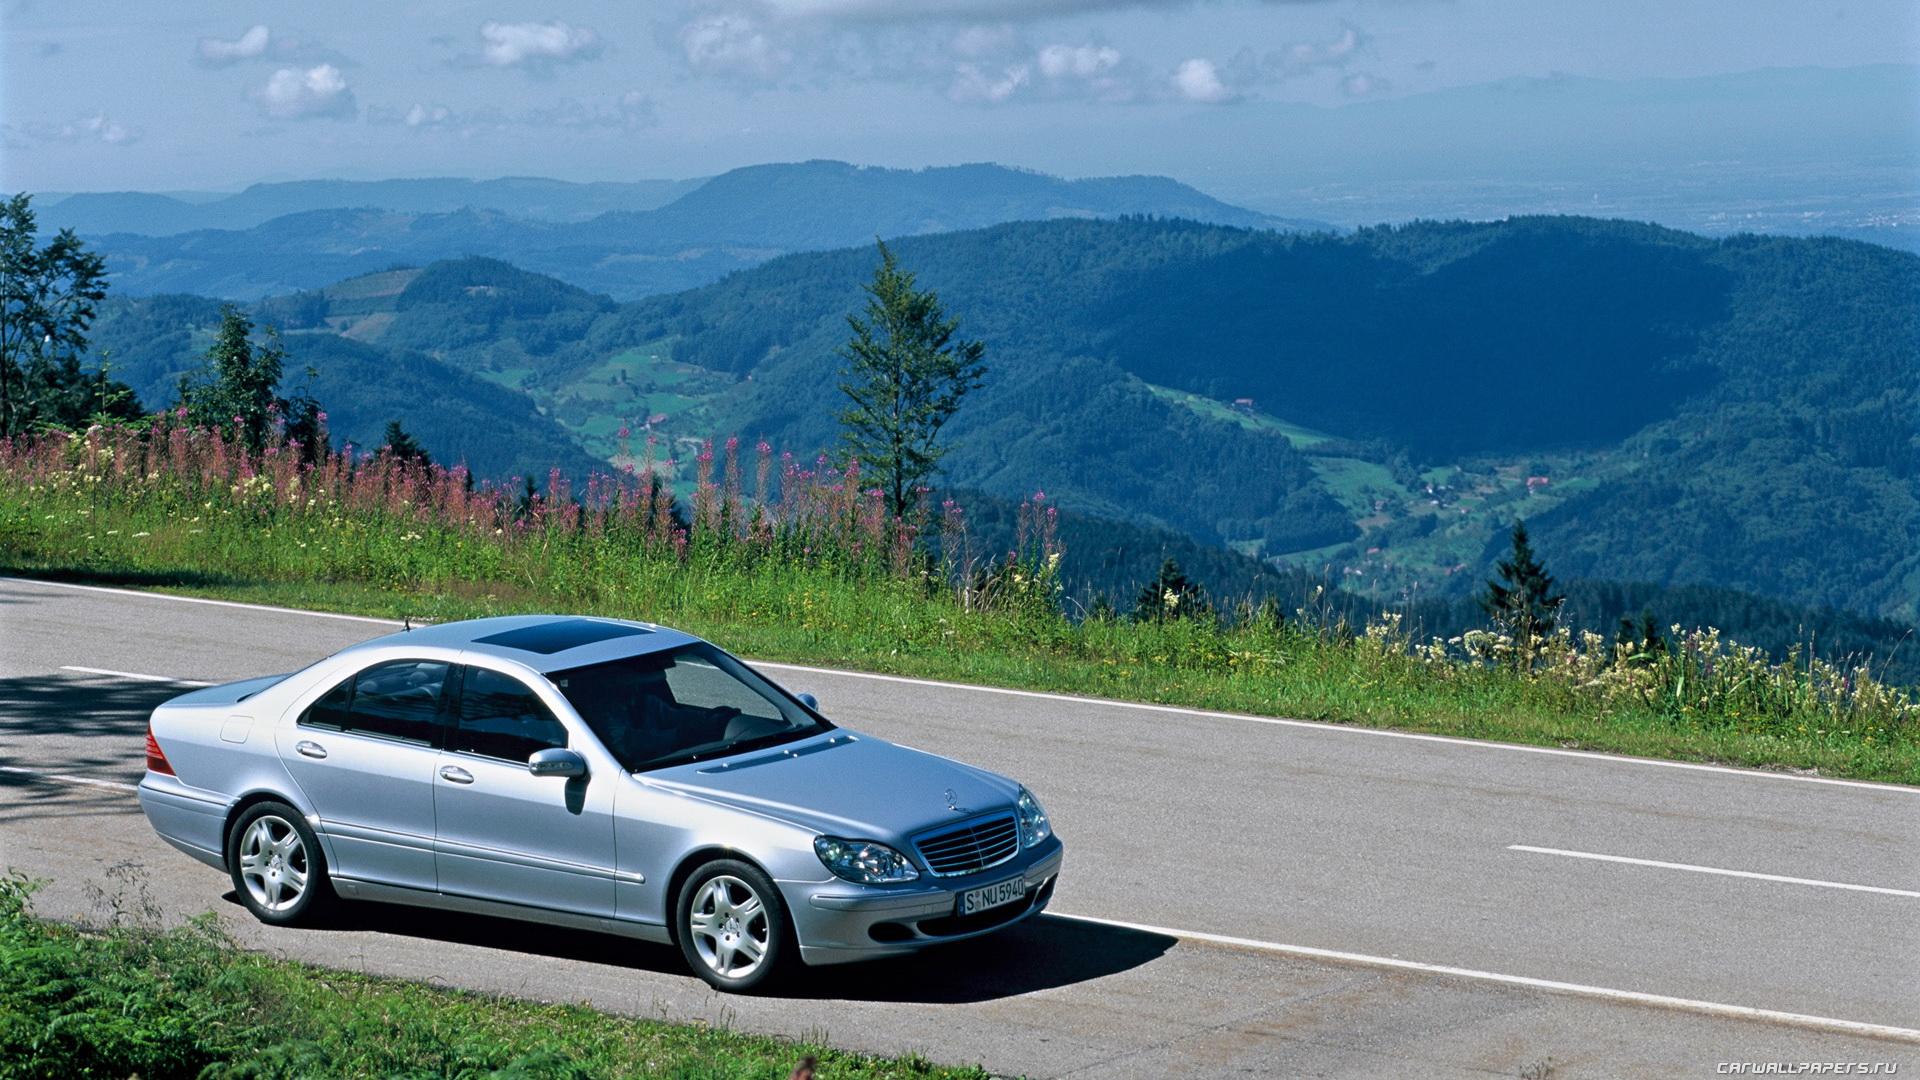 Cars desktop wallpapers Mercedes-Benz S500 4matic w220 - 2002